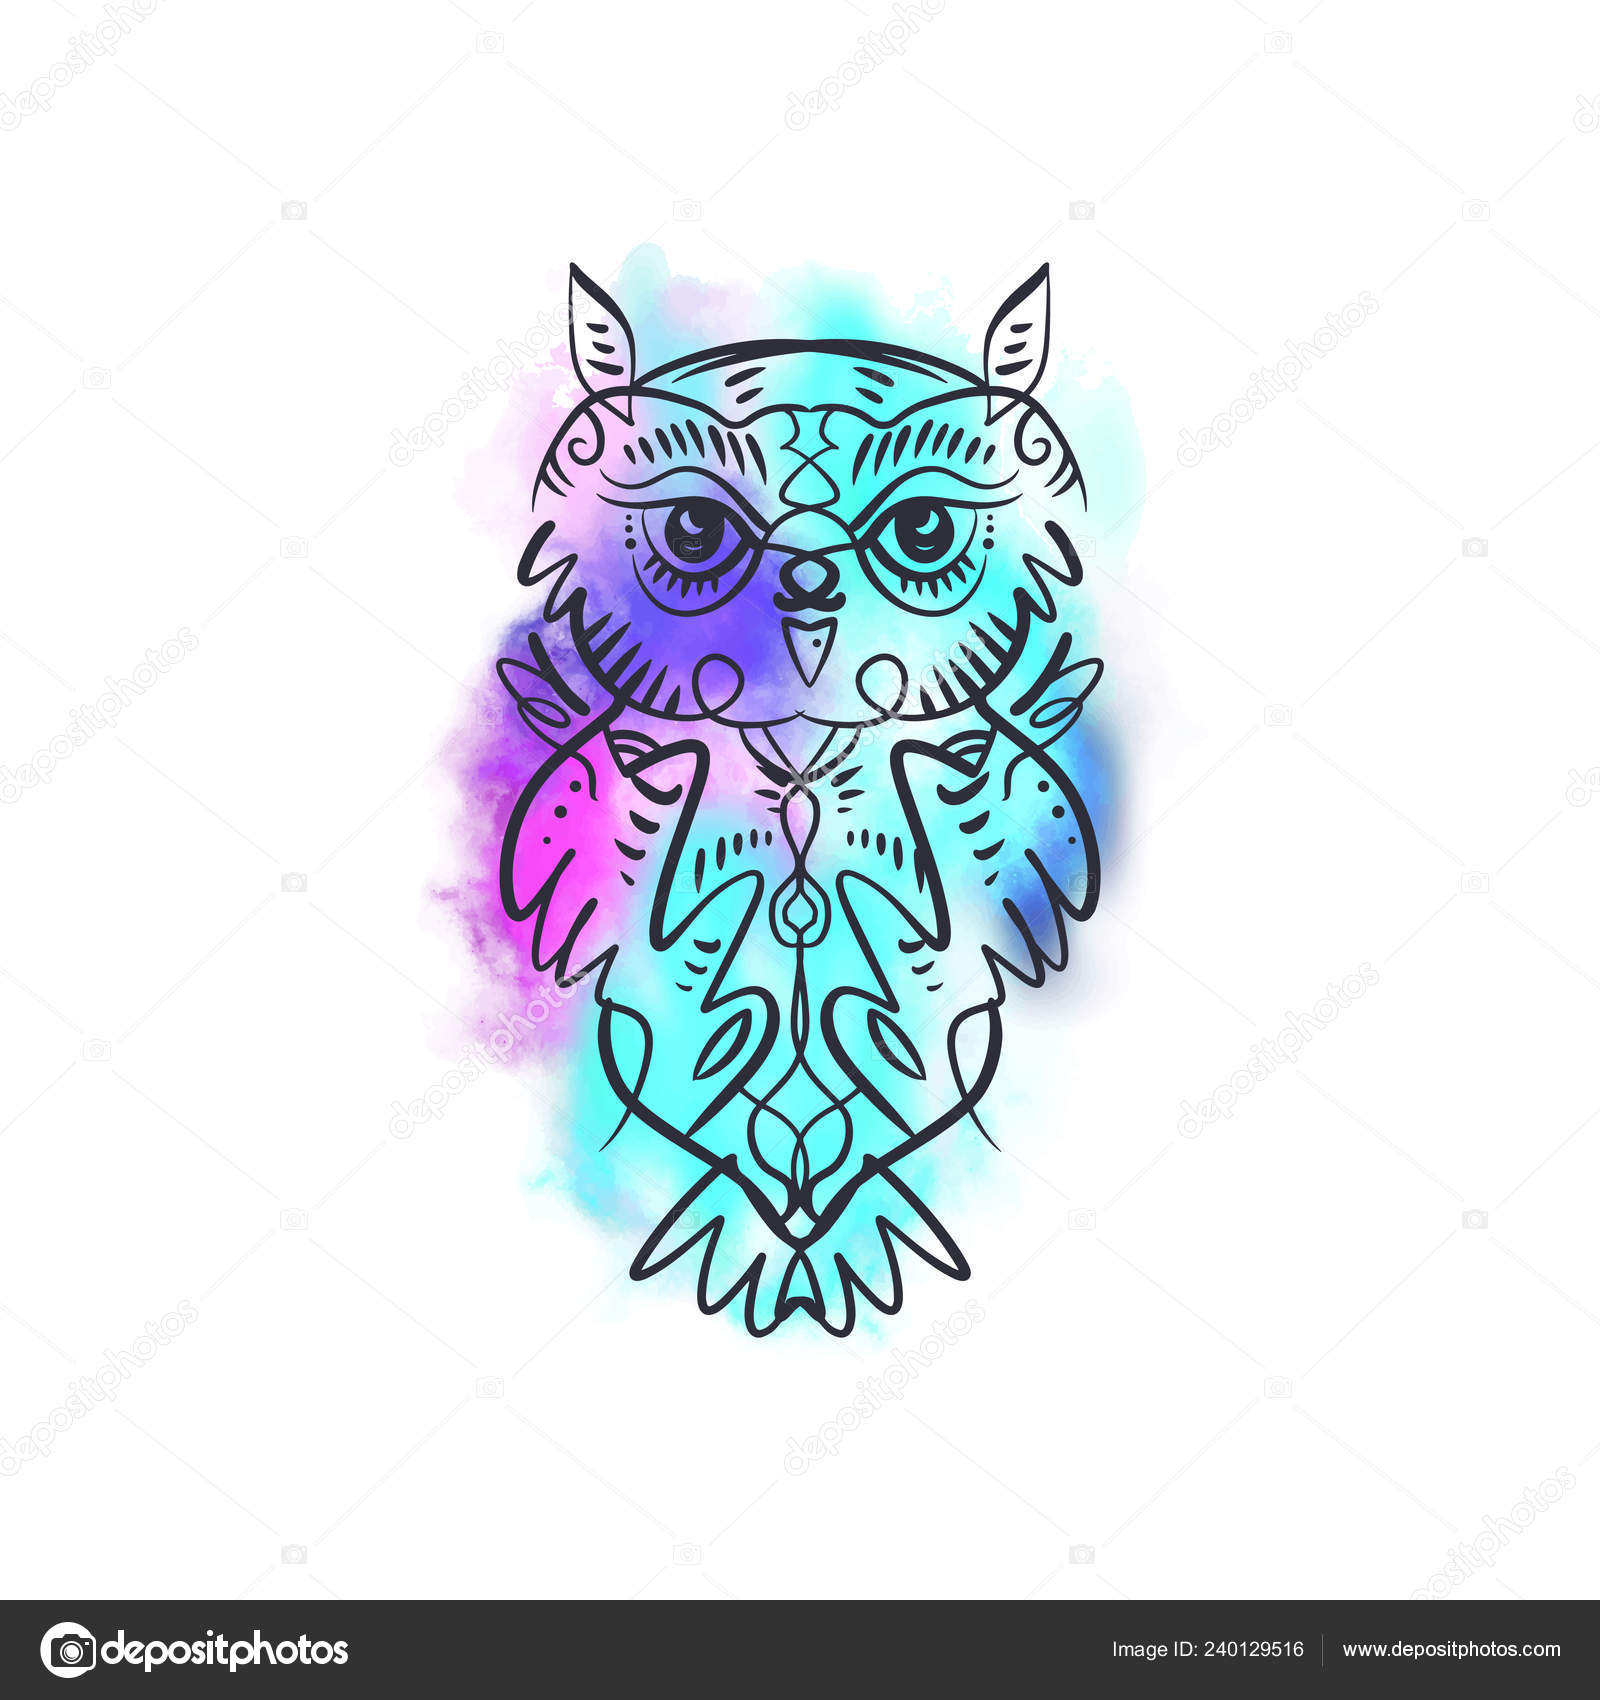 Watercolor Owl Tattoo Watercolor Owl Tattoo Boho Tribal